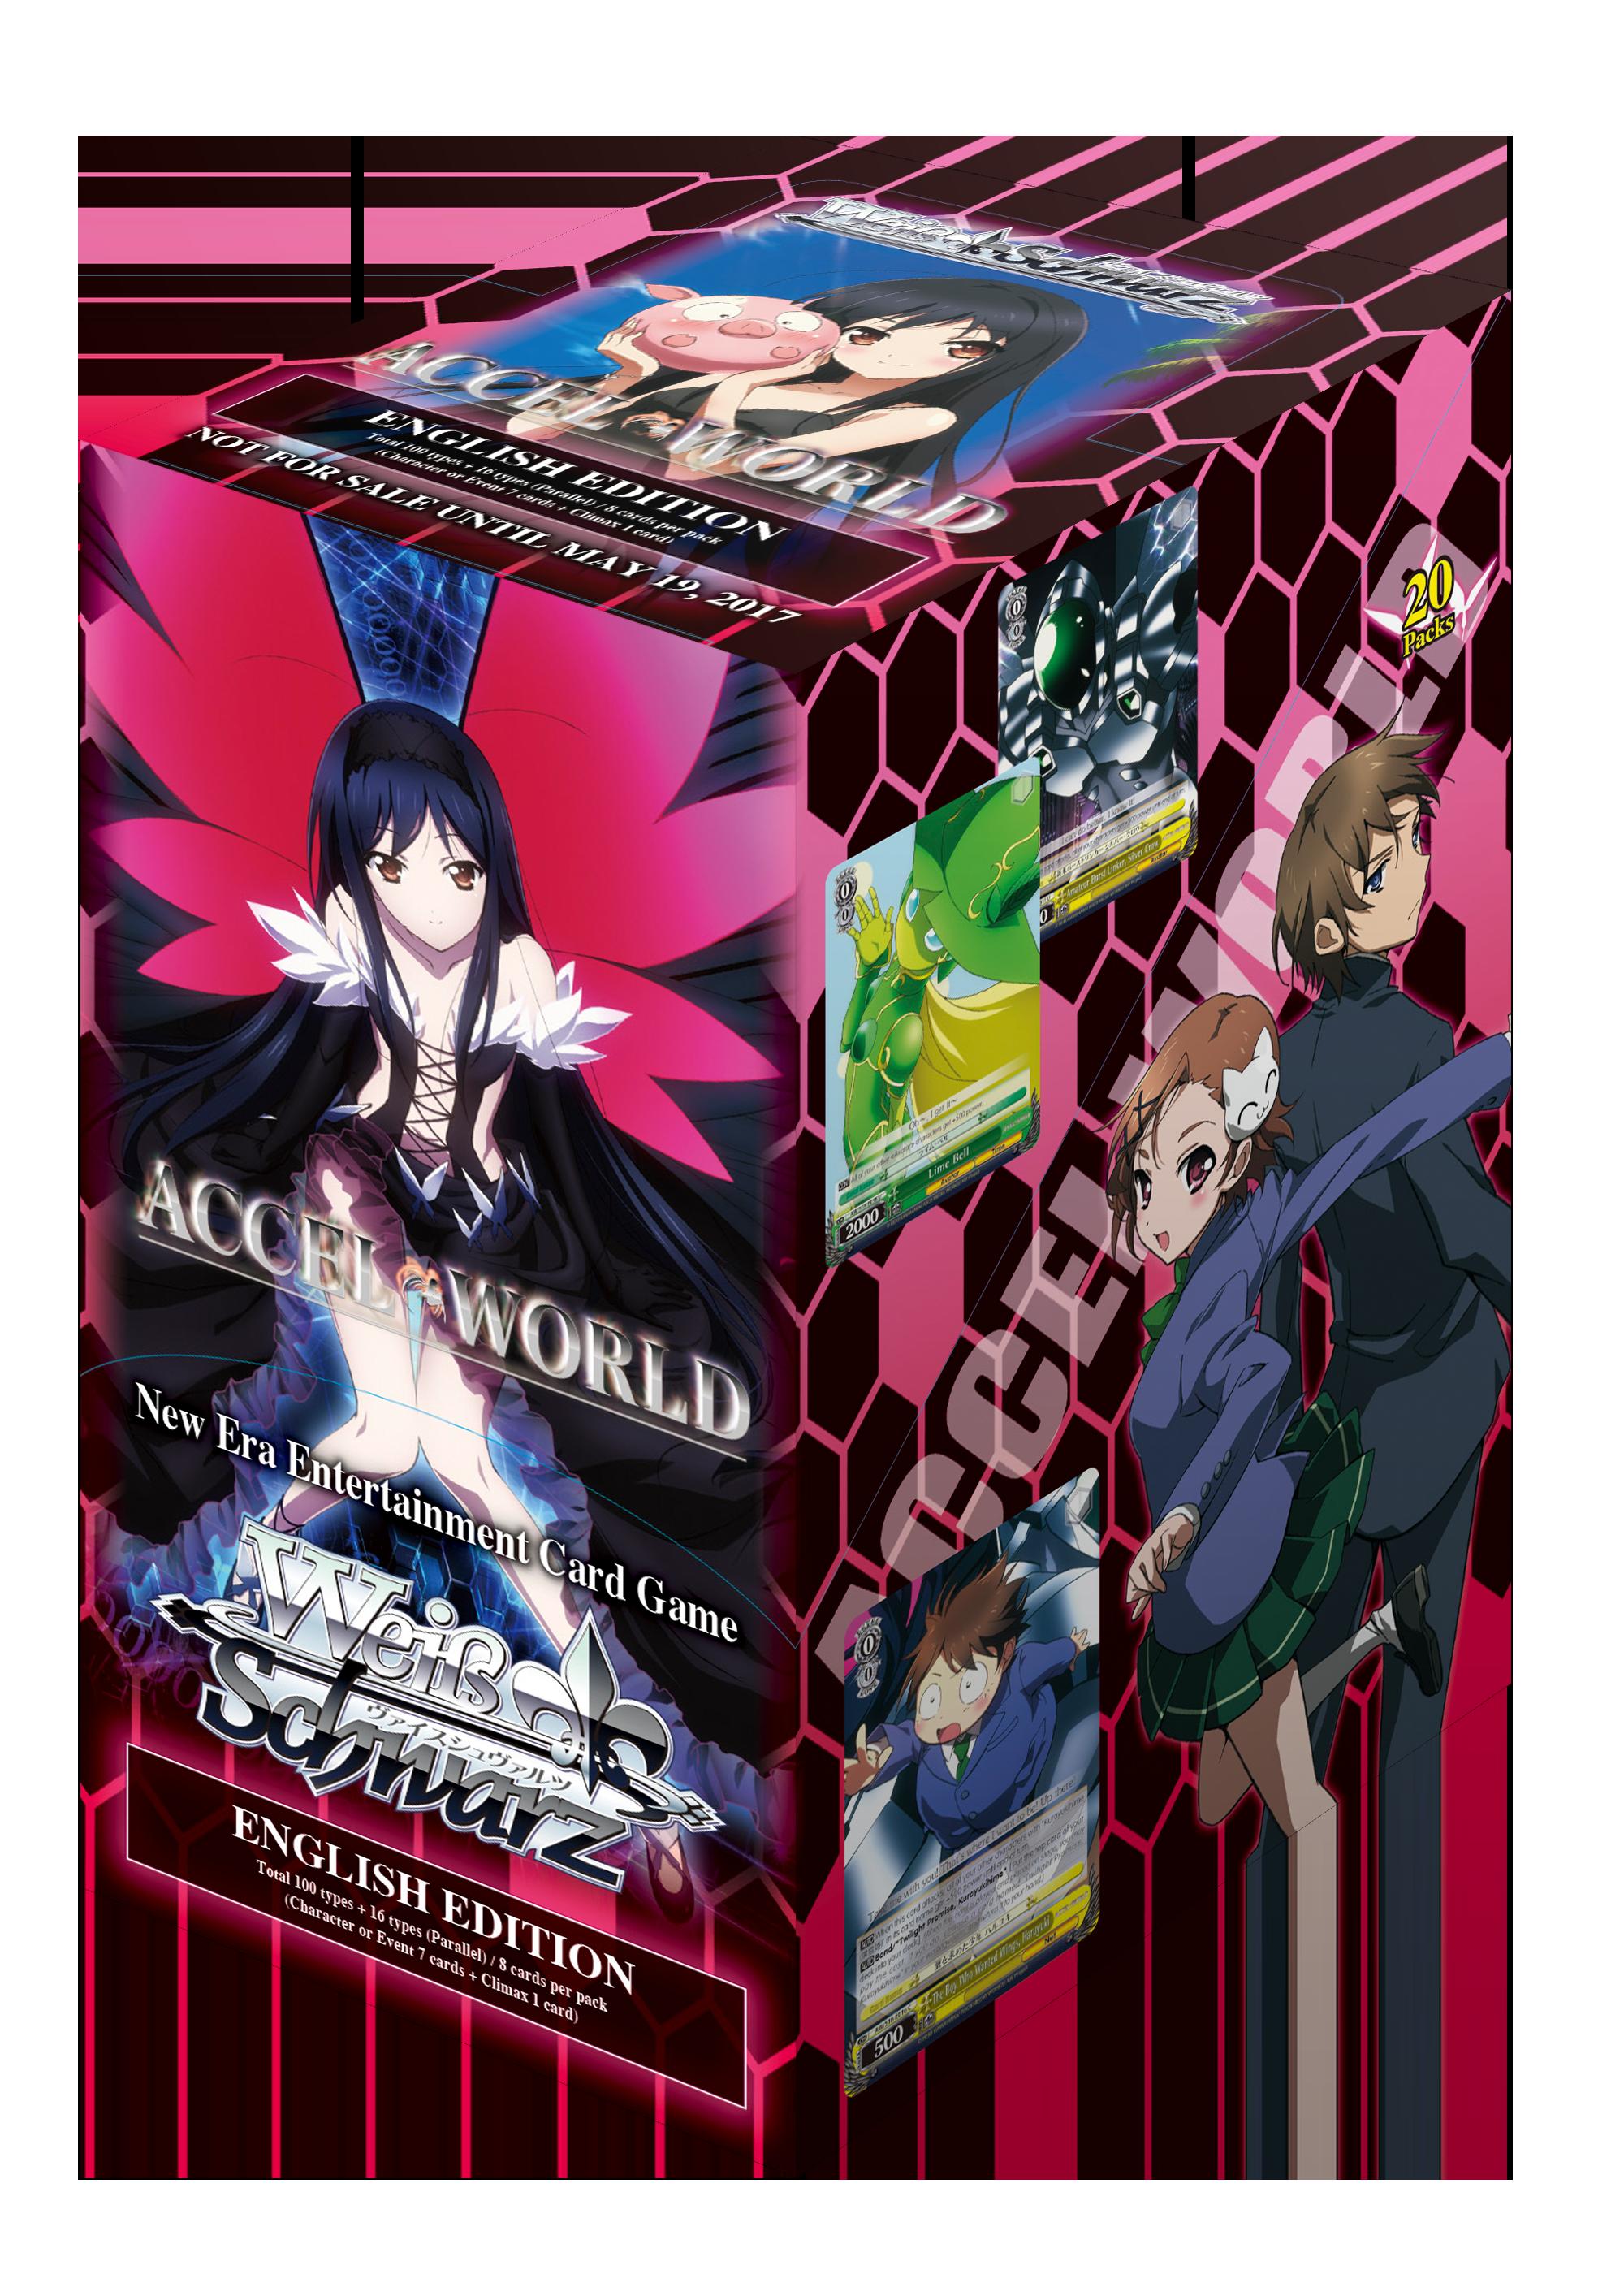 Accel World Booster Box (English Edition)